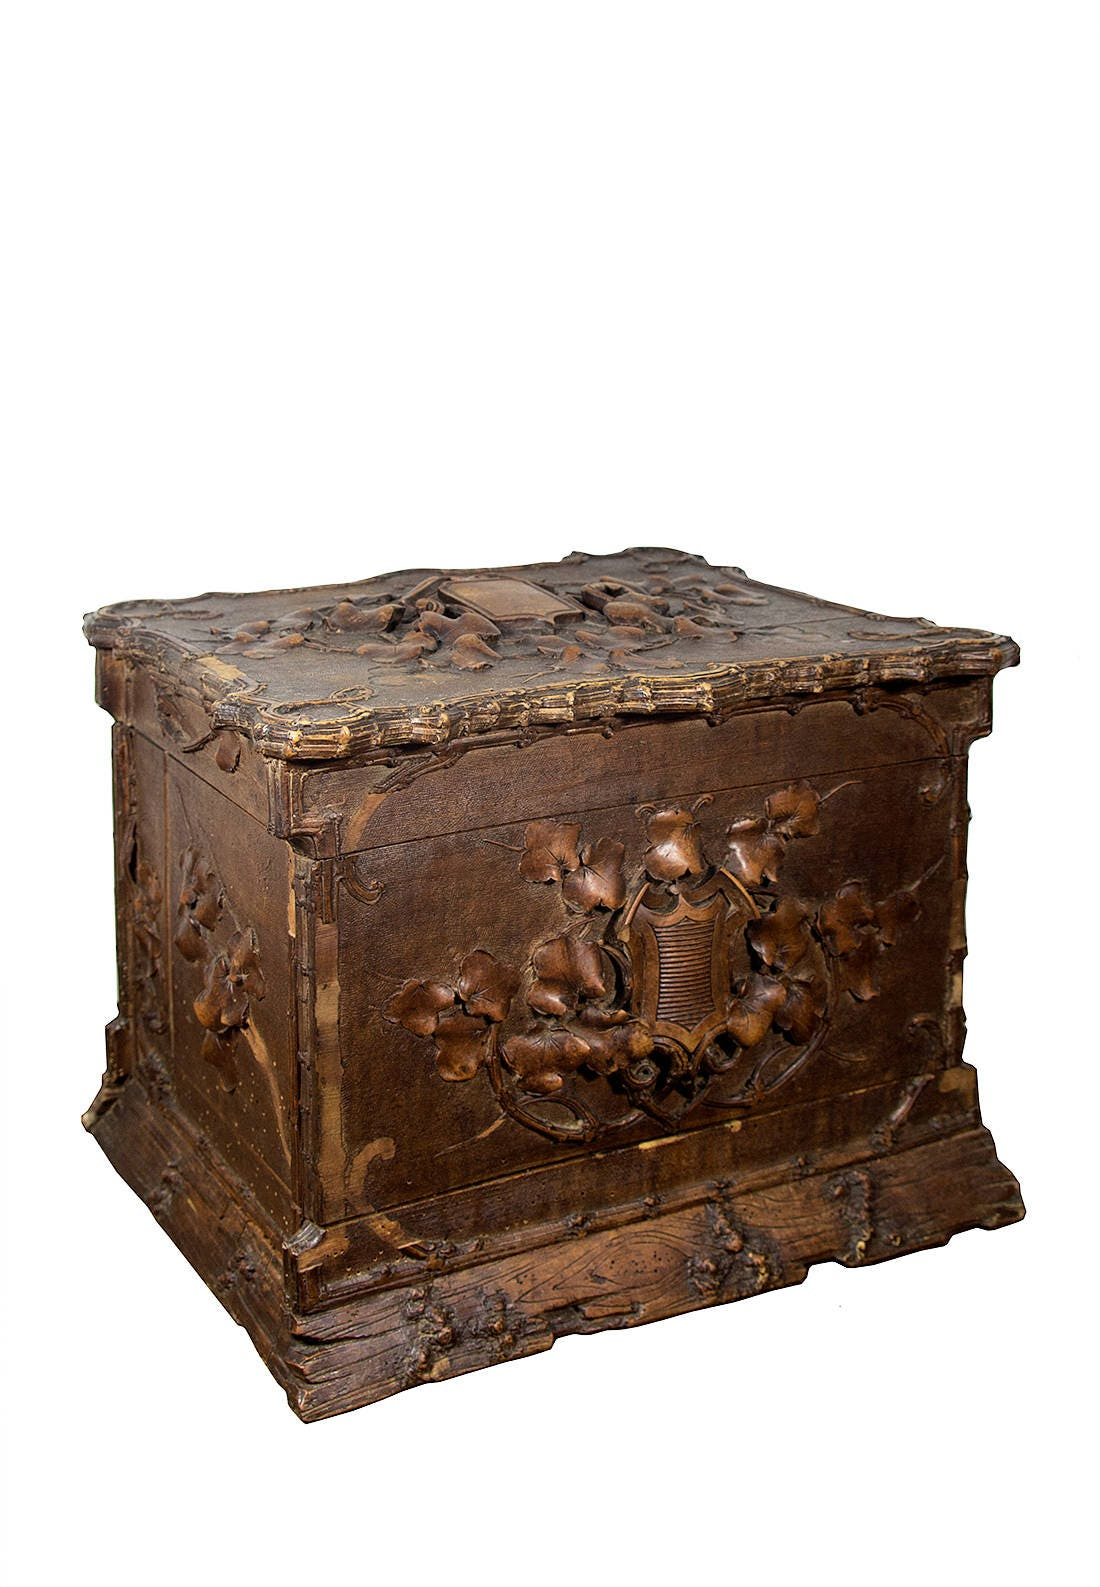 Antike Tantalus Box Schnaps Box Bar Schrank geschnitzt Holz